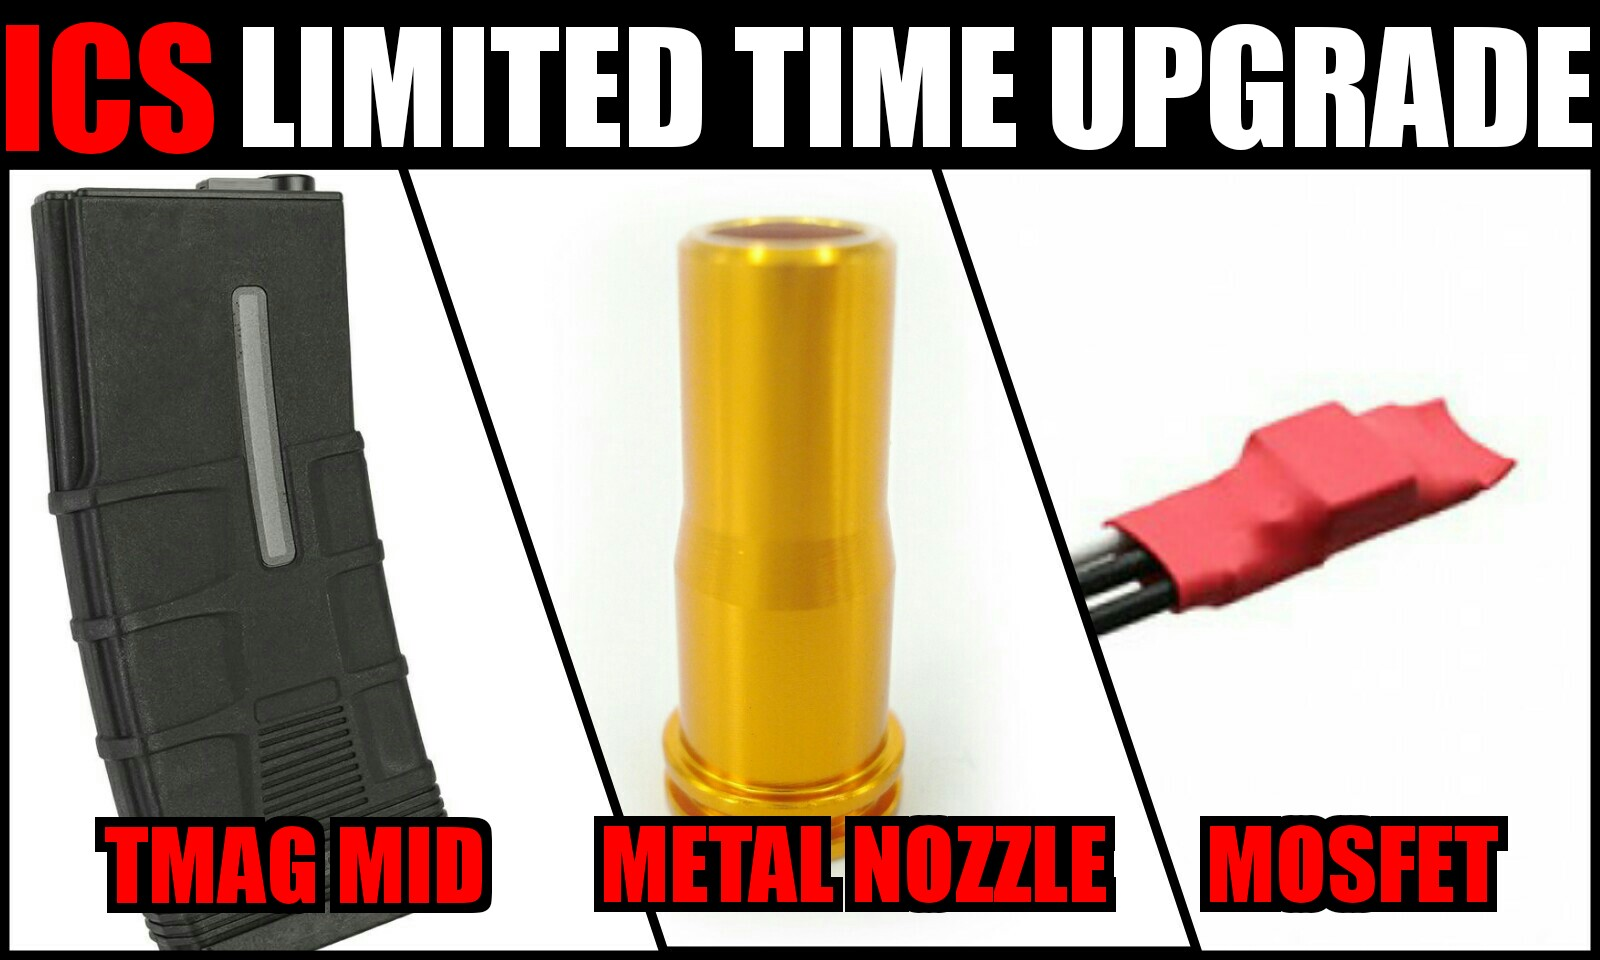 ics-limited-time-upgrade.jpg